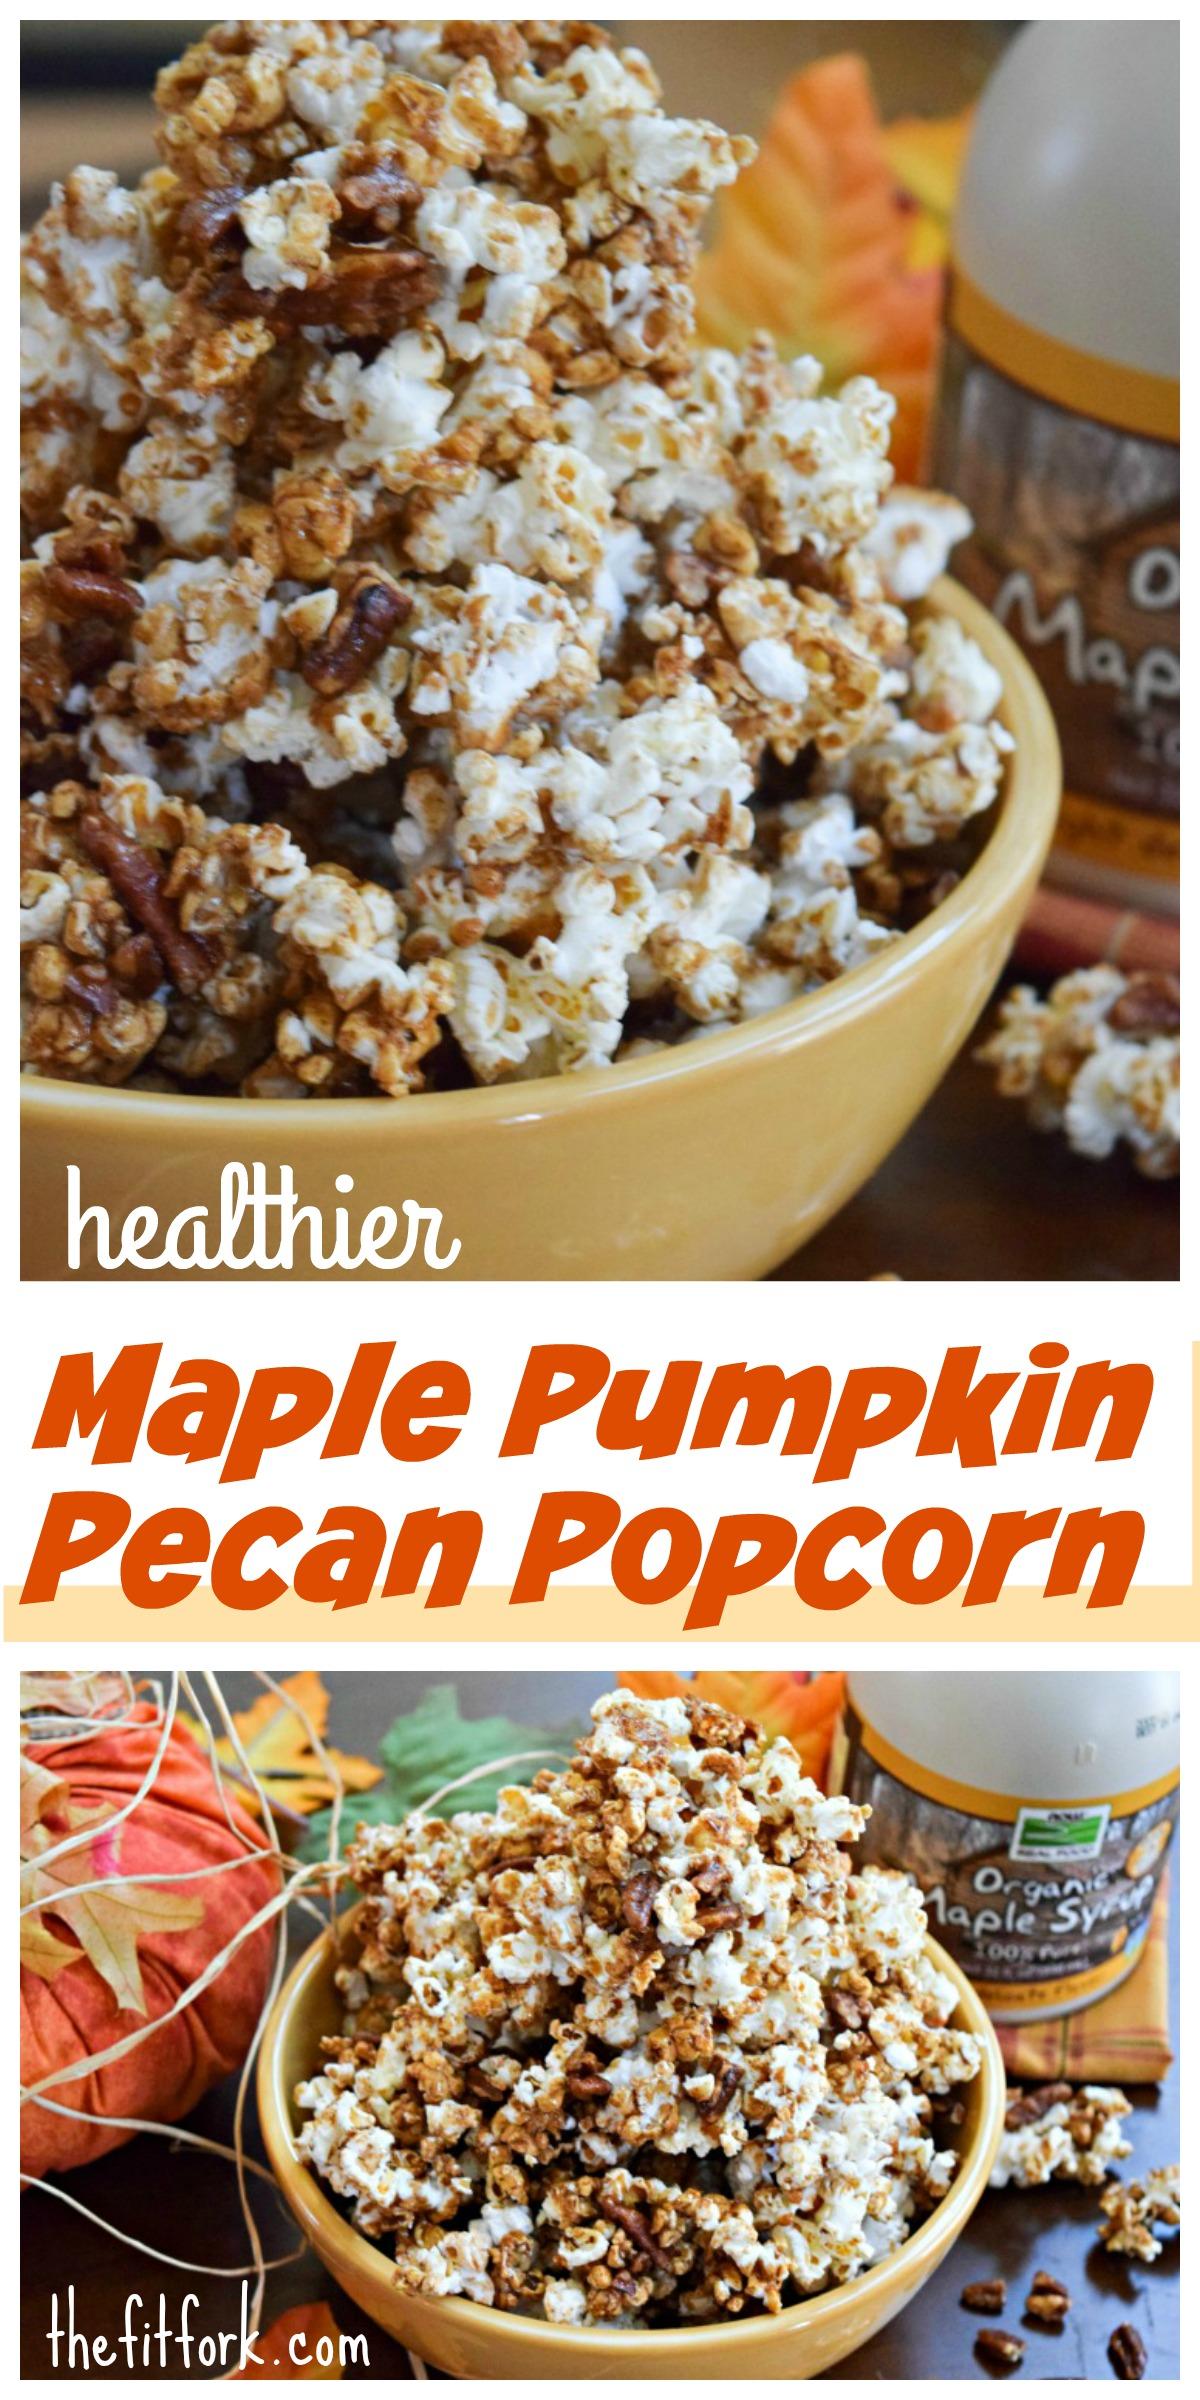 Maple Pumpkin Pecan Popcorn features all the flavors of fall an healthier sugar alternatives!